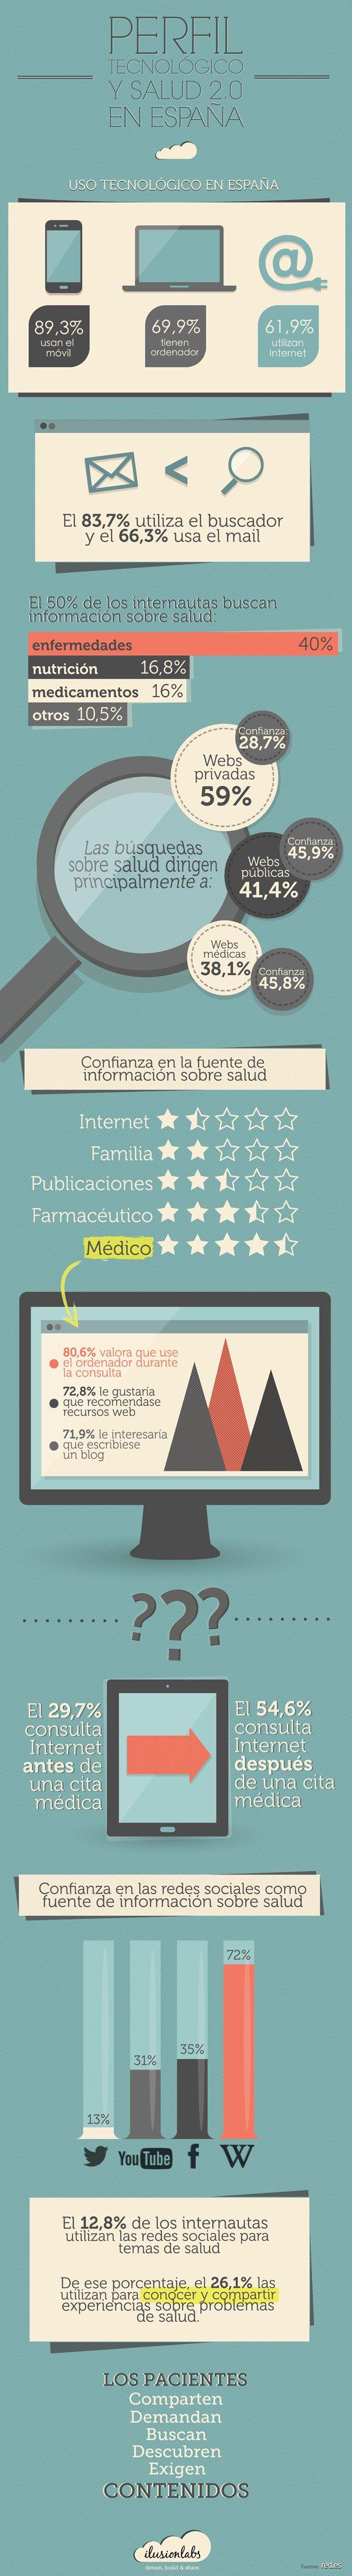 Consumo de salud 2.0 en España #infografia